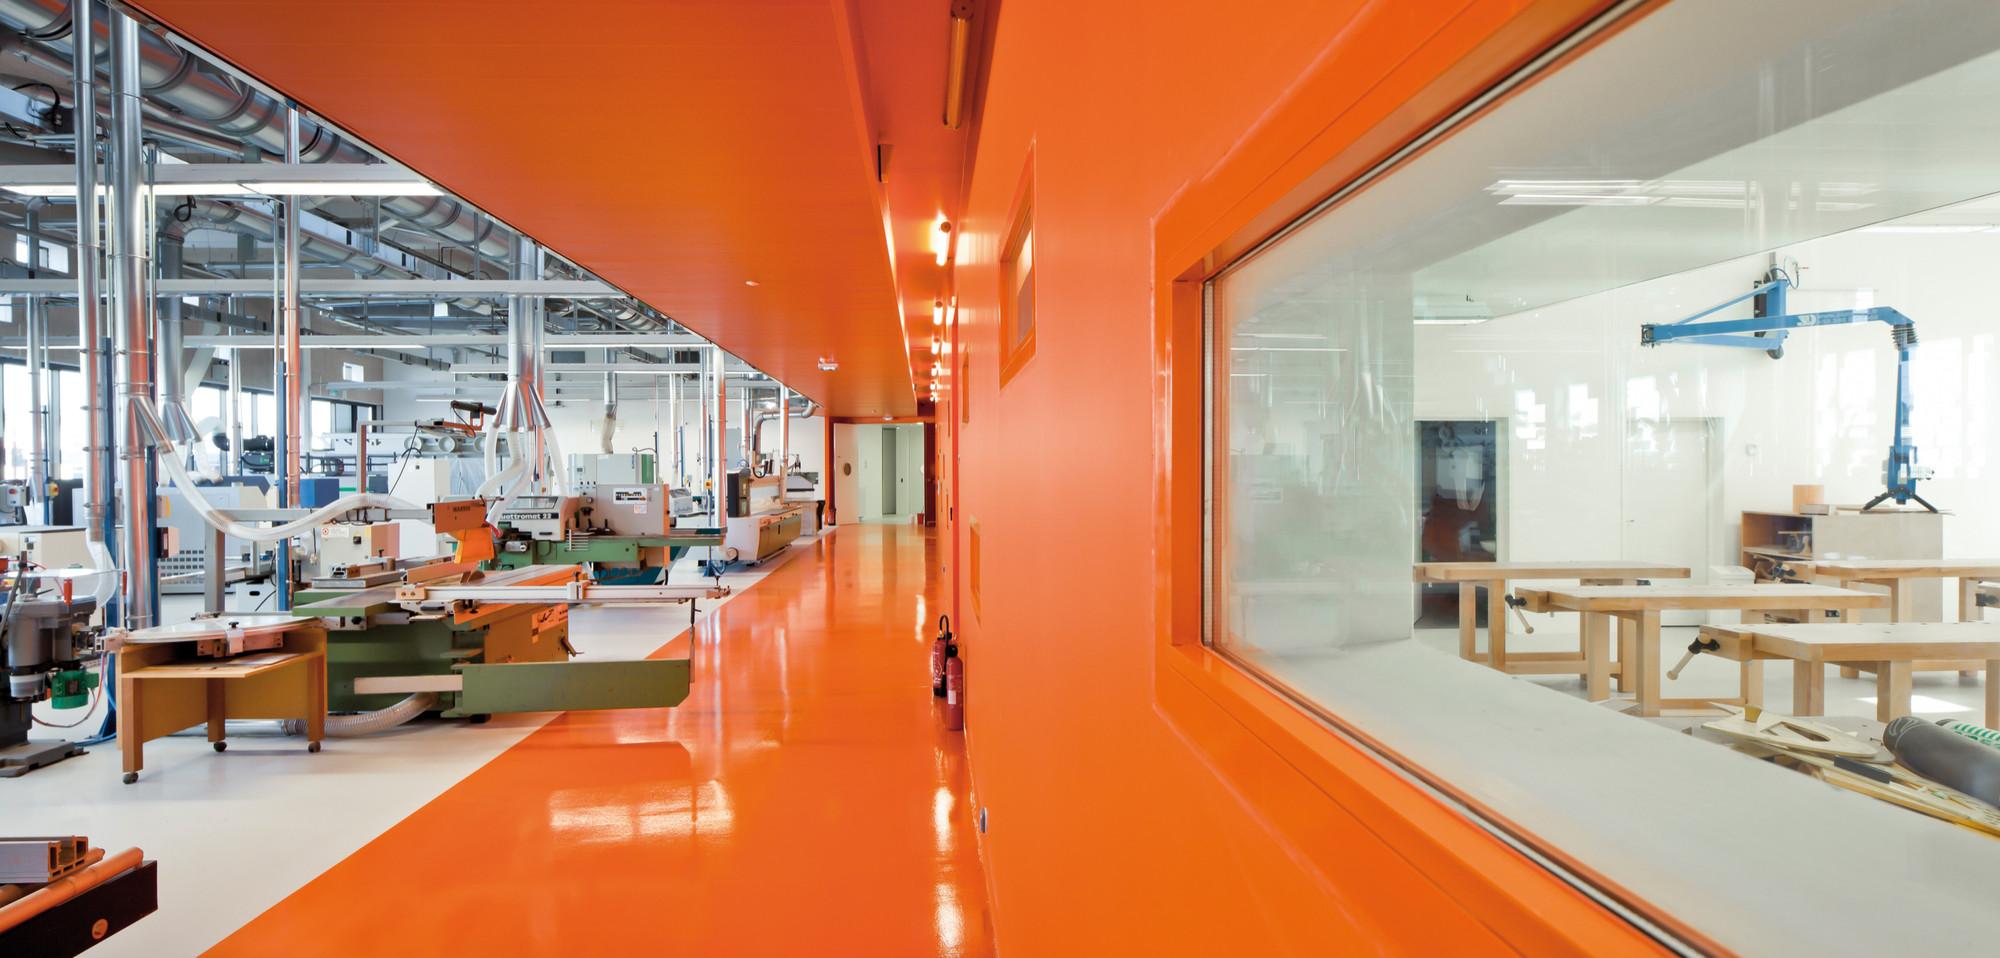 Gennevilliers  Training Center / Atelier d'Architecture Brenac-Gonzalez